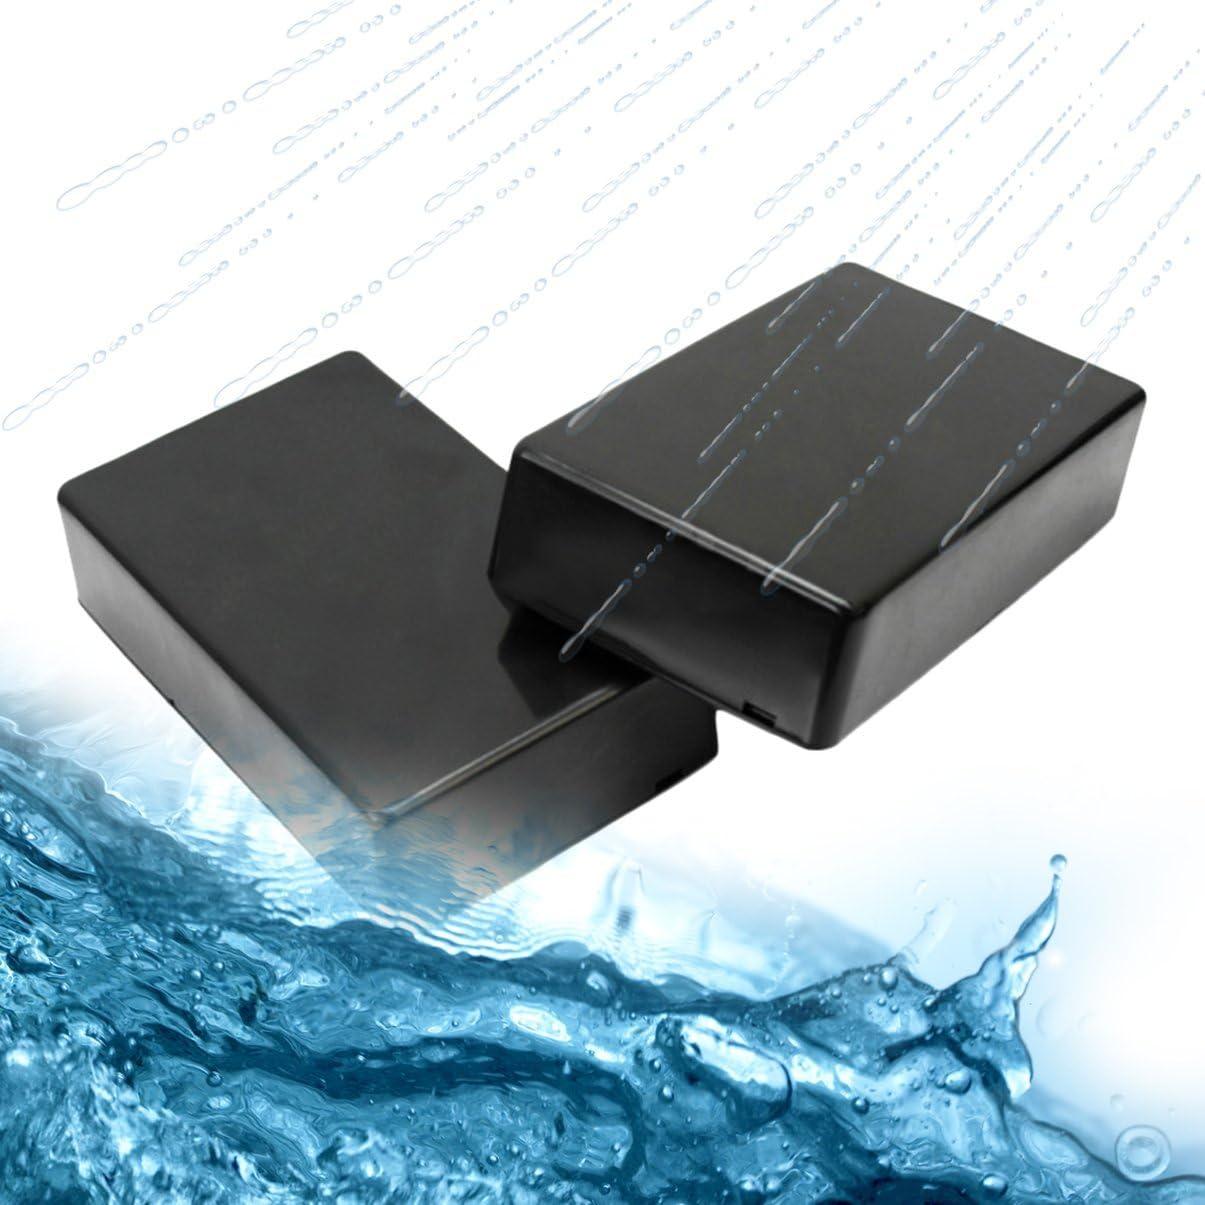 5Pcs DIY Plastic Electronic Project Box Enclosure Instrument 100x60x25mm Electronics Stocks Power Waterproof Box